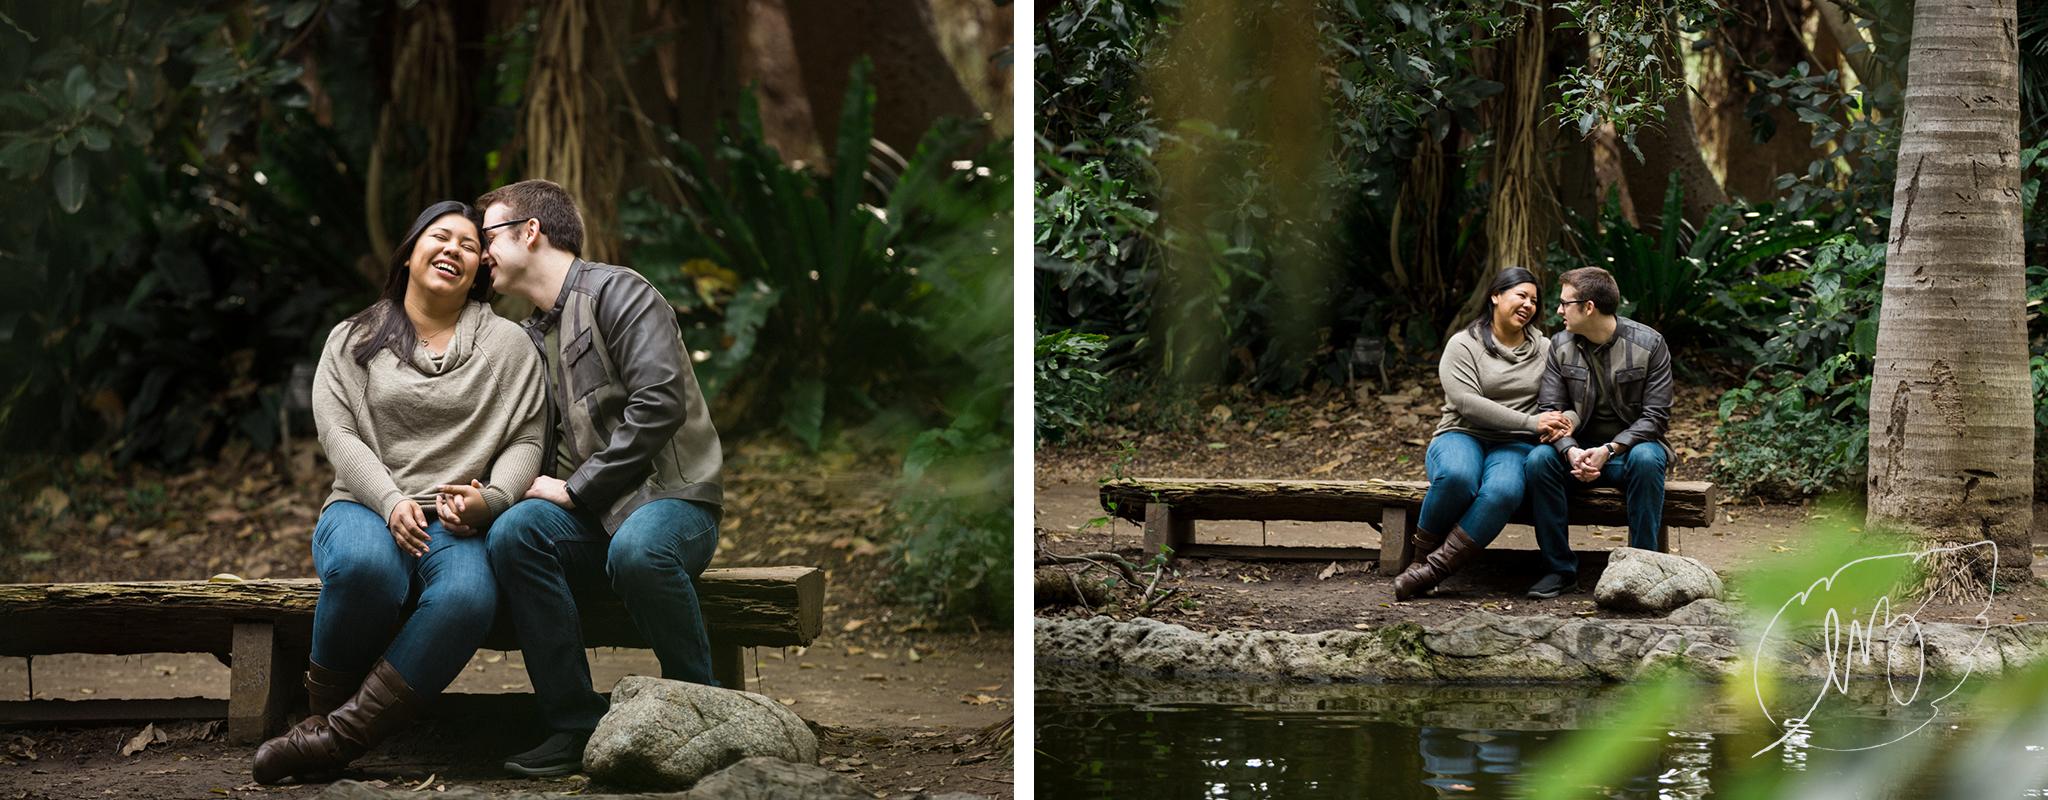 Los_Angeles_Arboretum_Engagement_Photographer_03.jpg